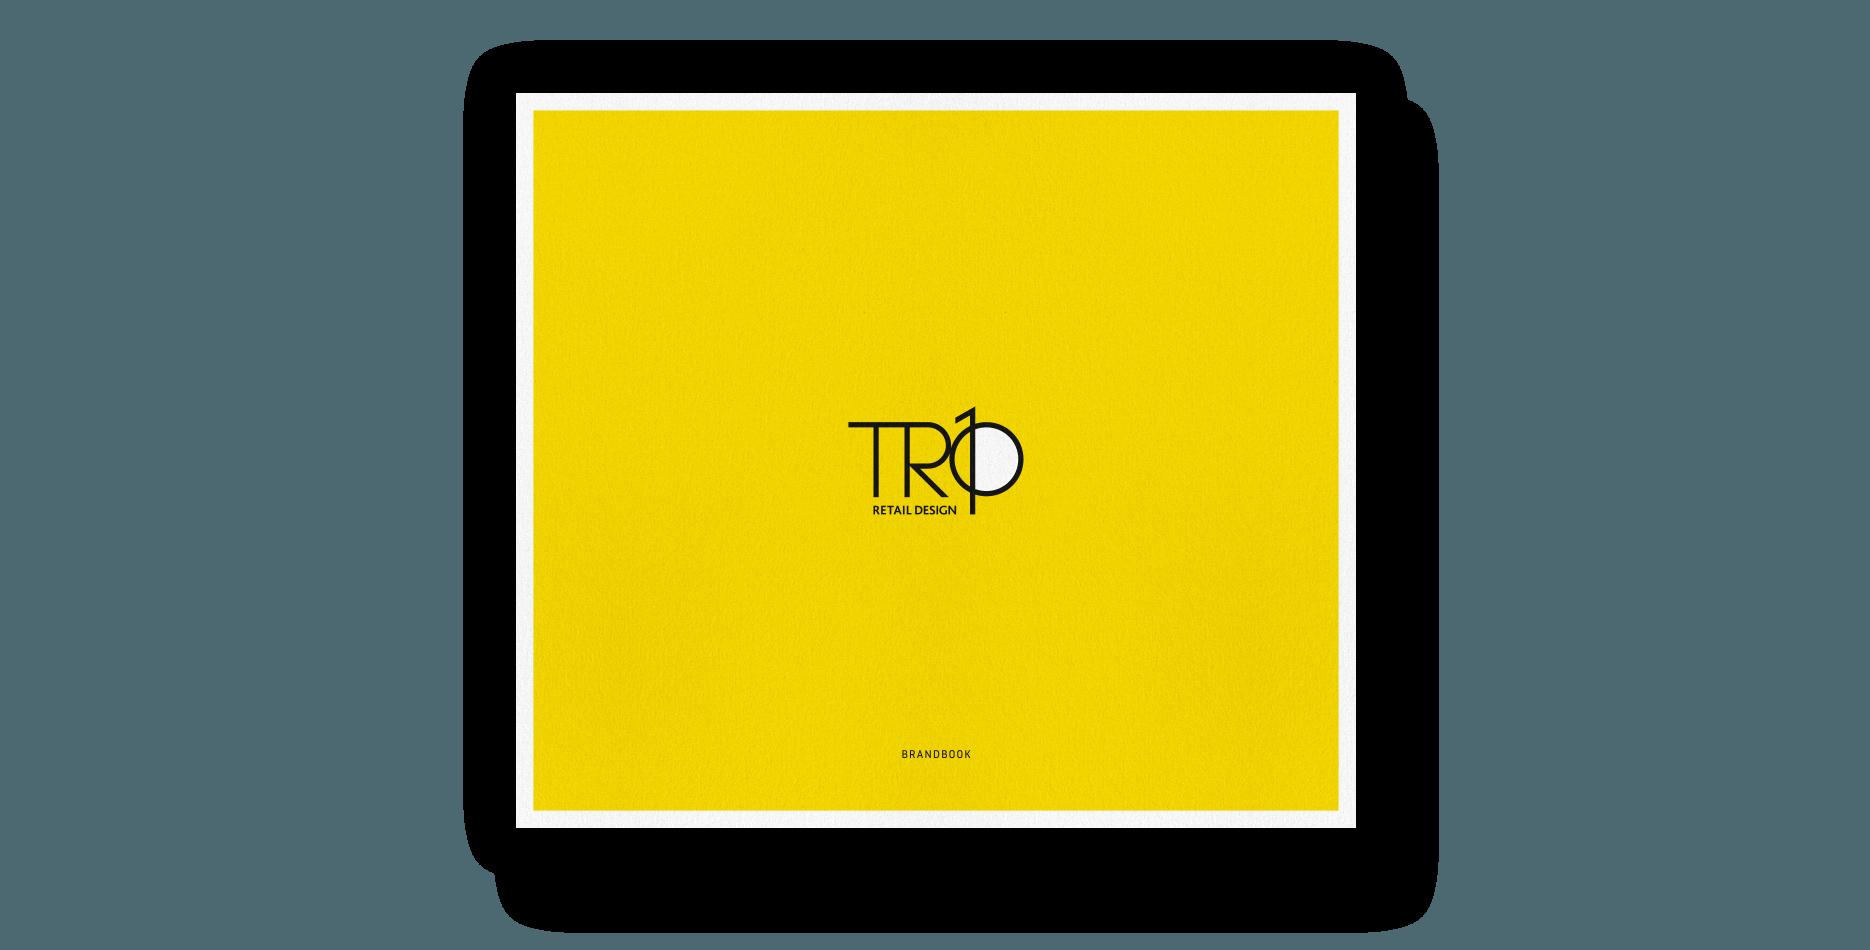 tr10-strategy-00-brandbook